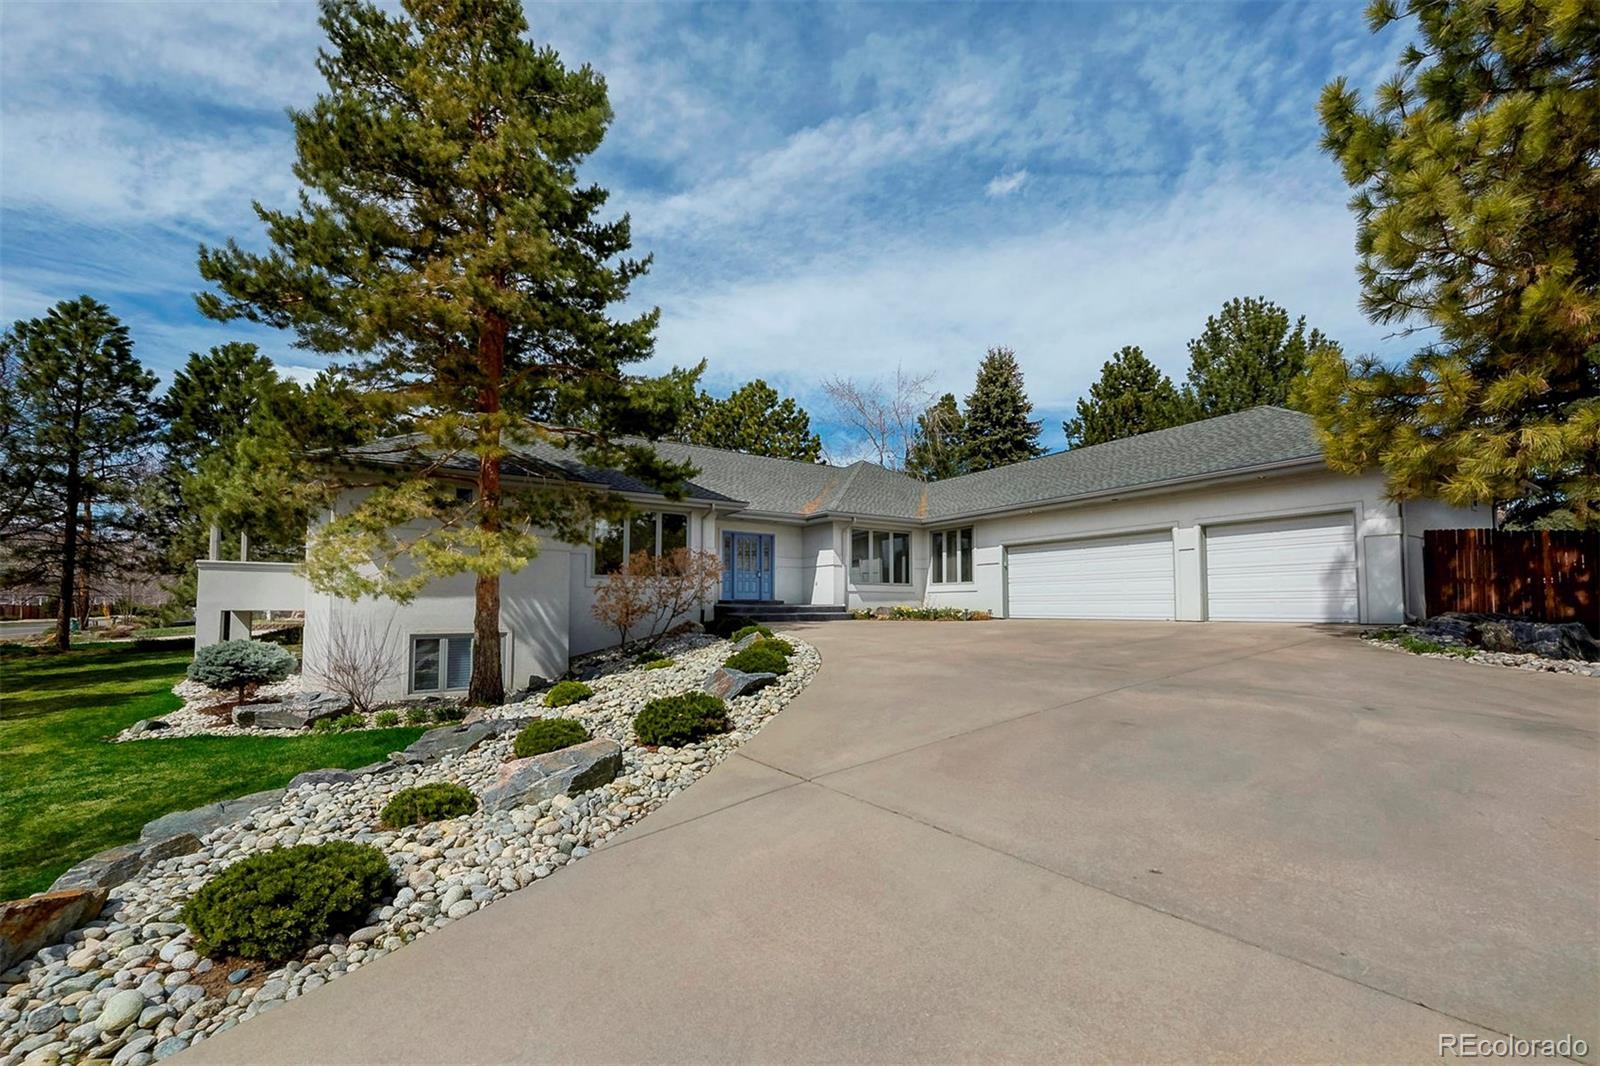 14553 W 58th Avenue, Arvada, CO 80002 - Arvada, CO real estate listing